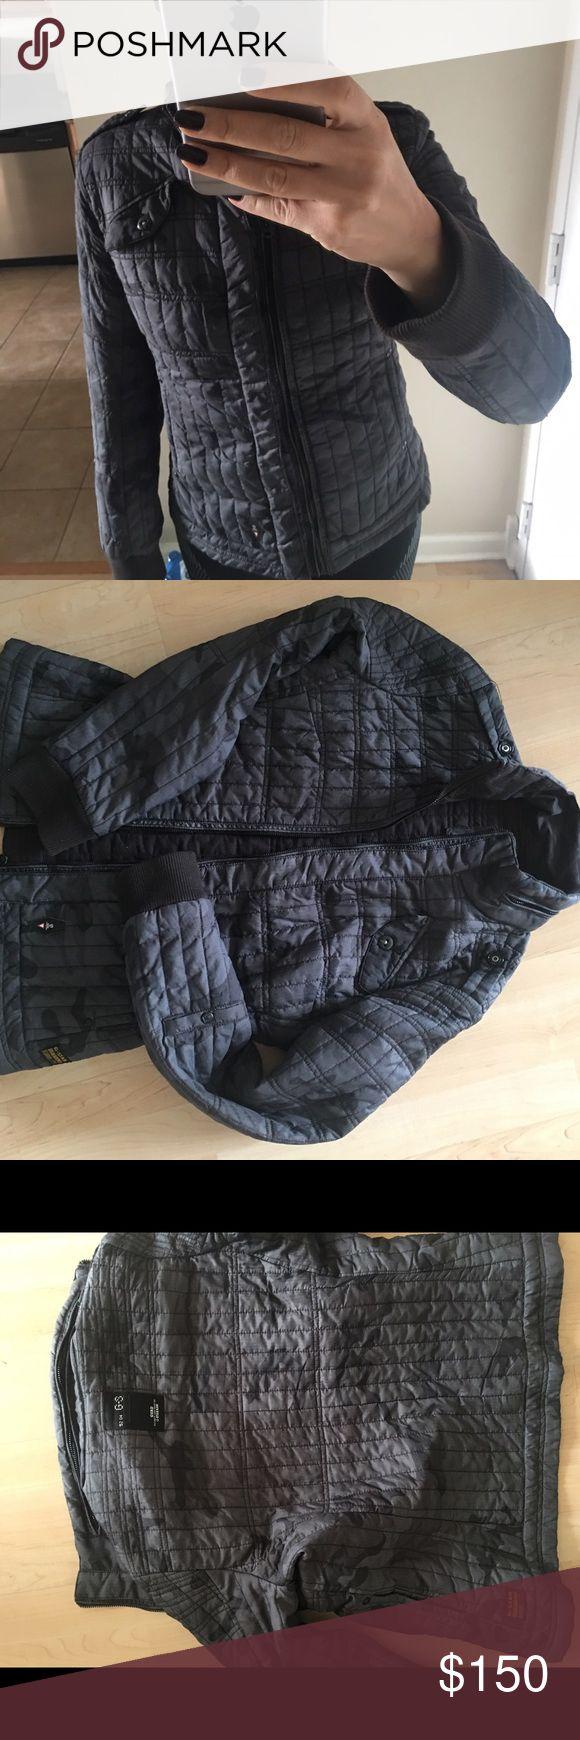 G star raw camo jacket medium Super cool G Star Raw camo jacket in grey tones. Size medium. G Star Raw  Jackets & Coats